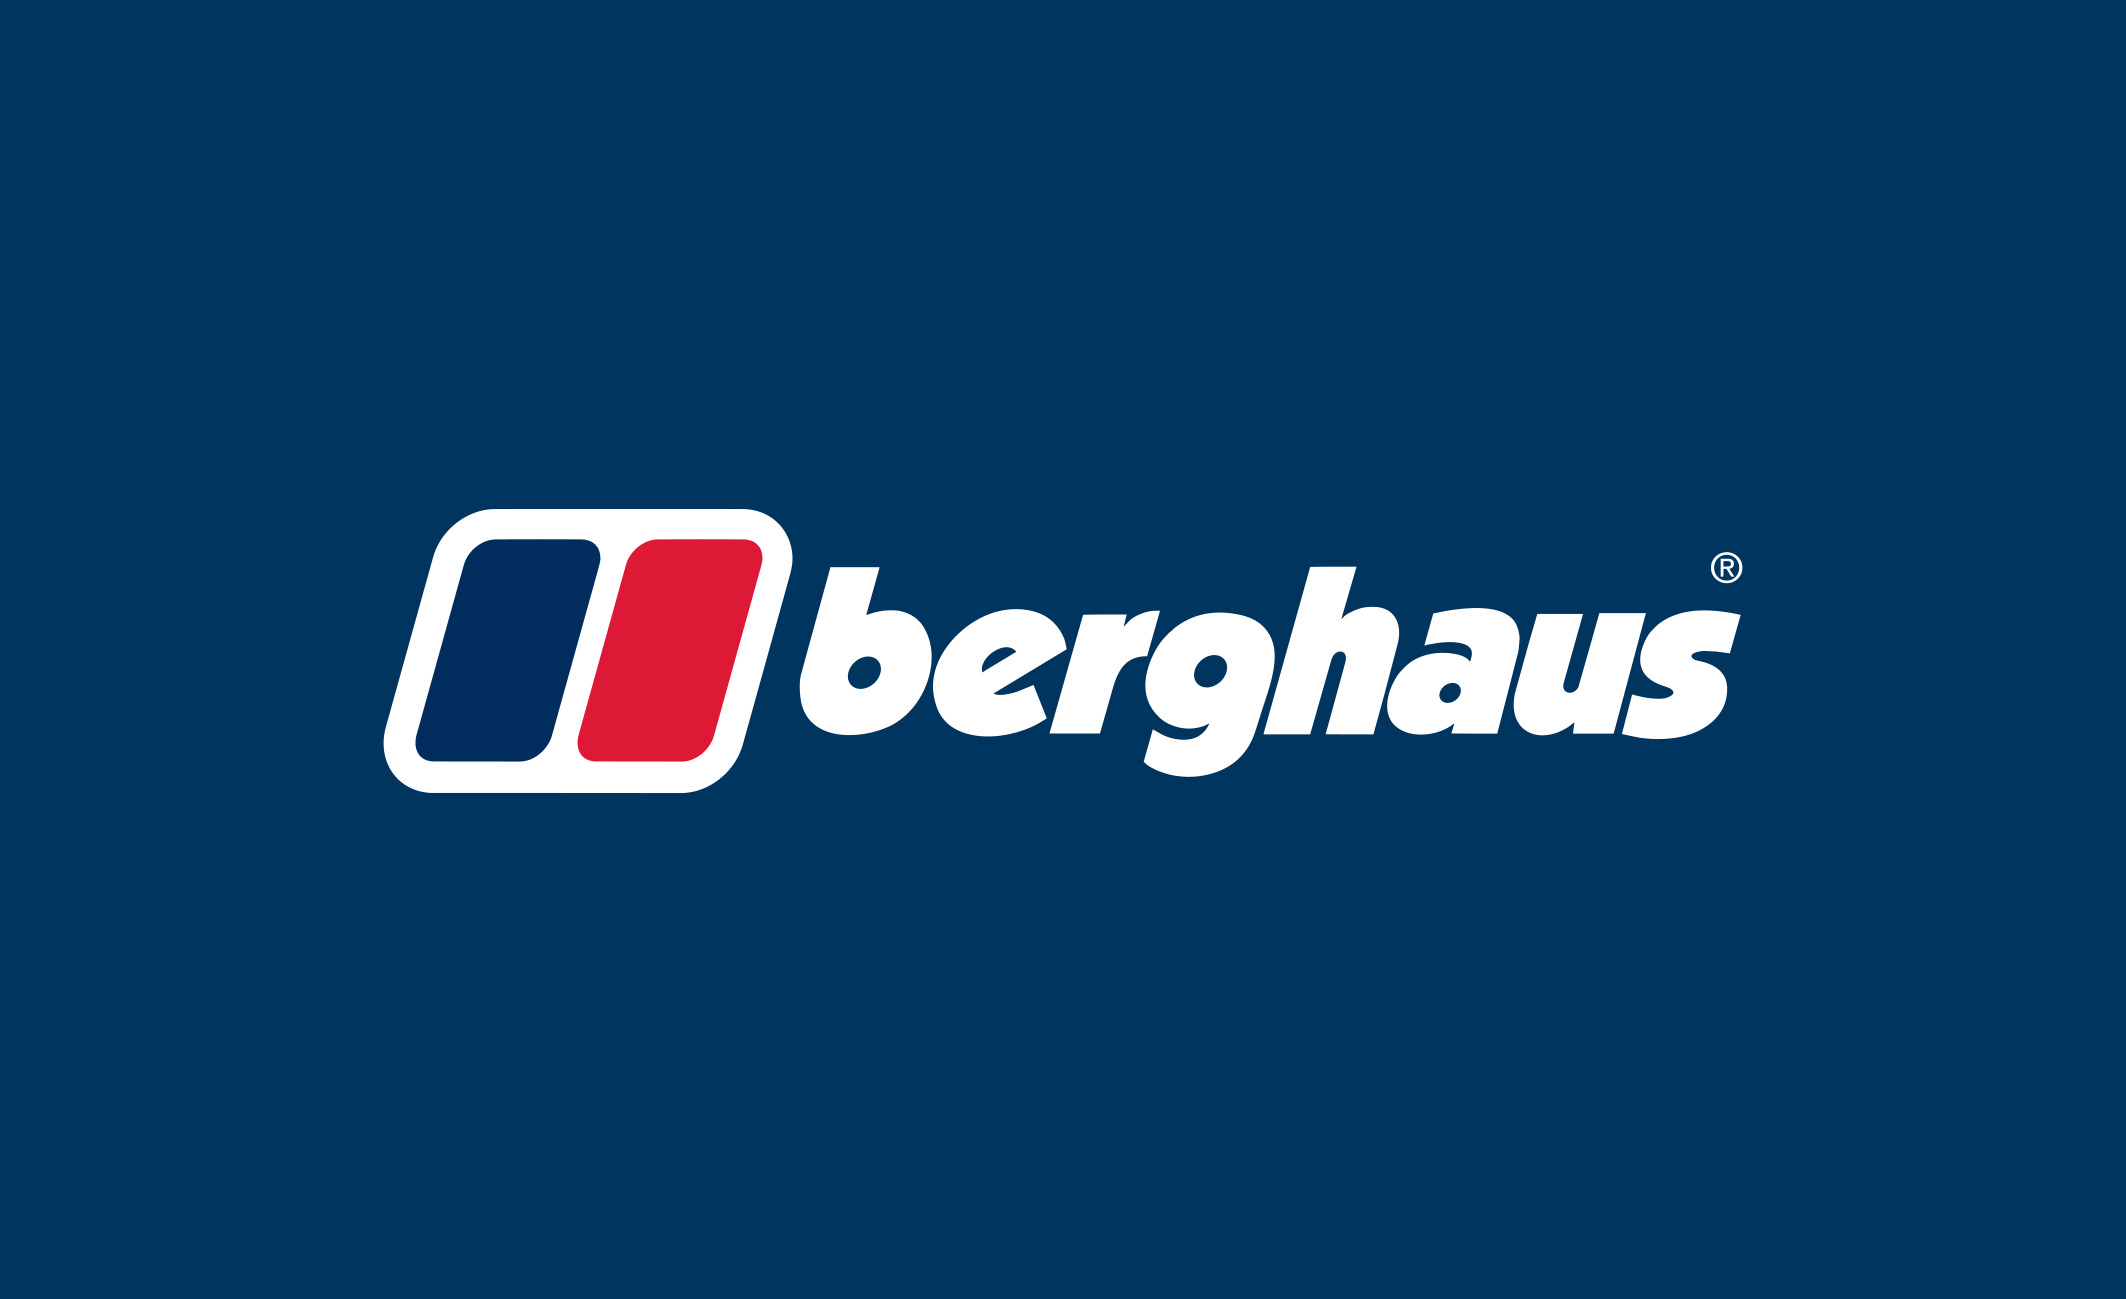 offres d u0026 39 emploi sport chez berghaus